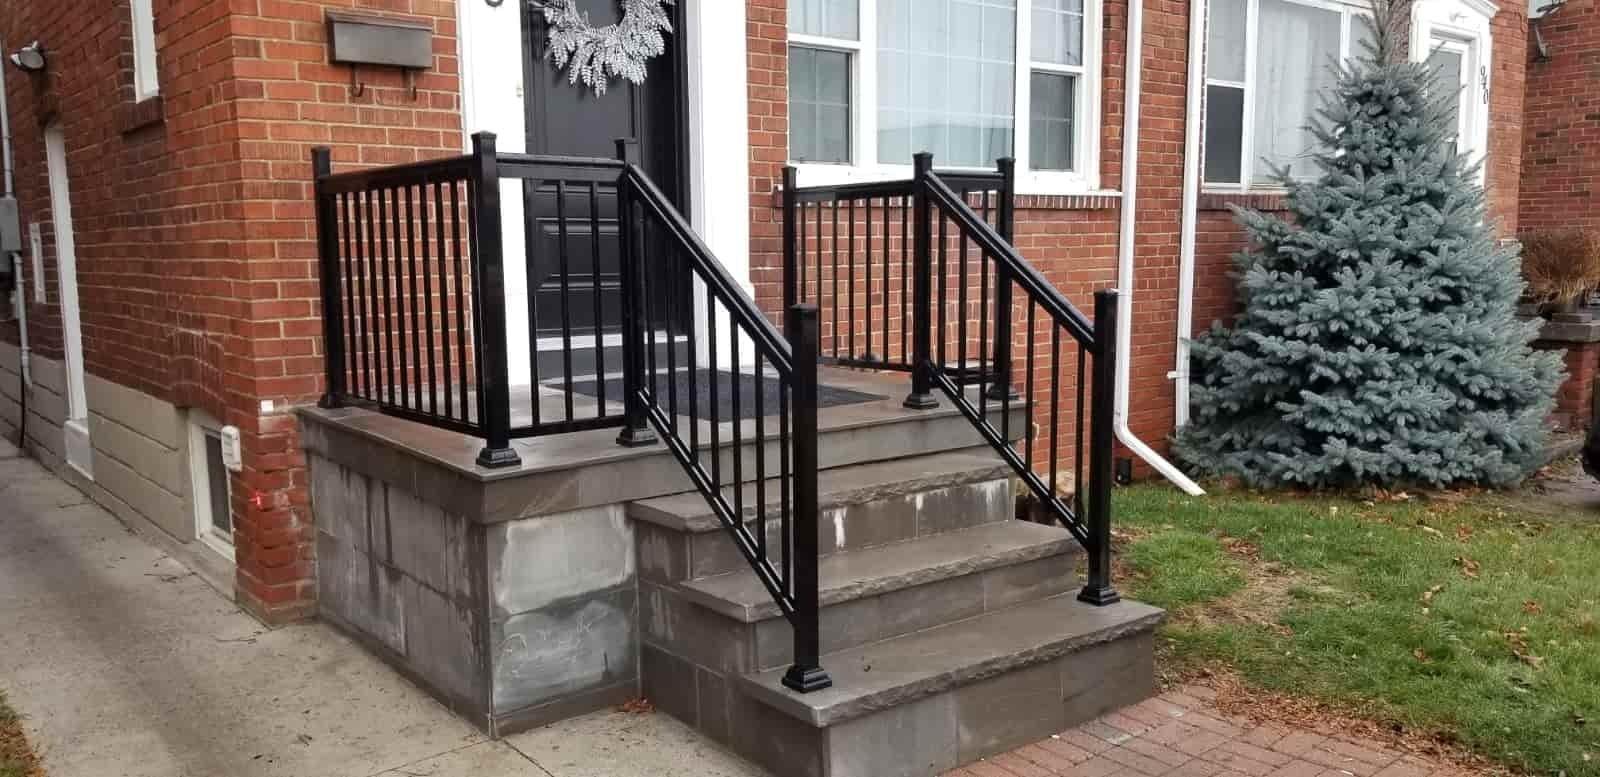 Aluminum Outdoor Stair Railings Railing System Ideas Diy | Aluminum Handrails For Steps